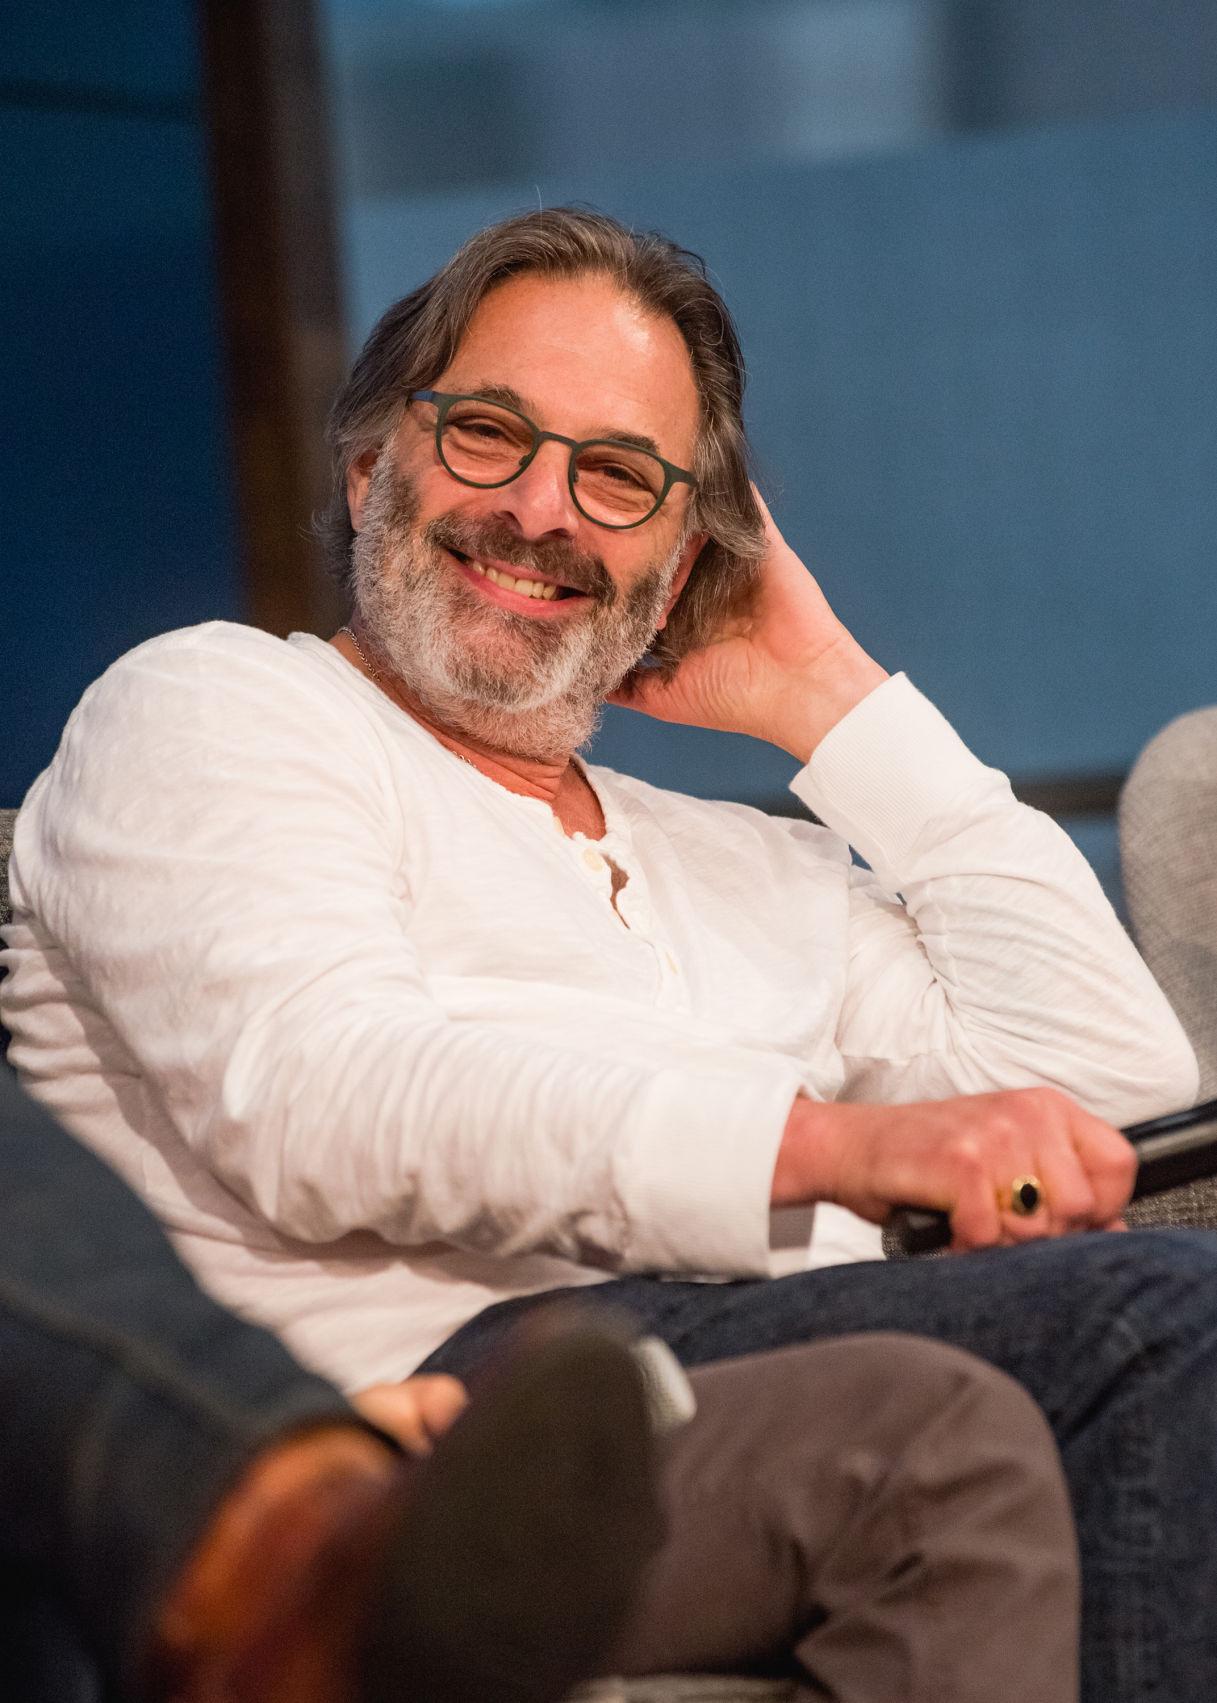 Amateur hookup pics men beards glasses